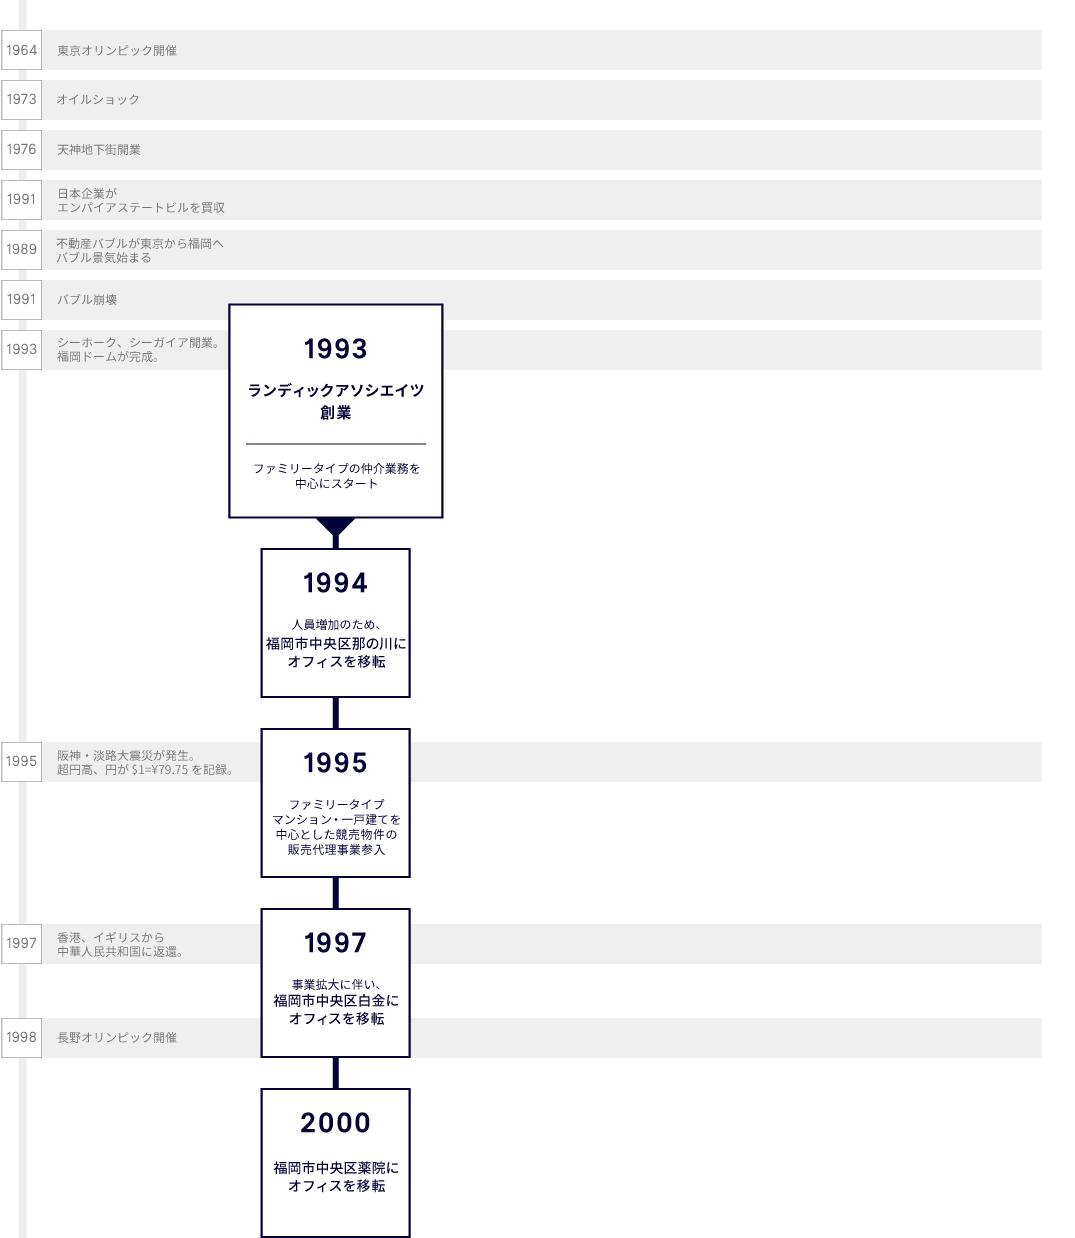 LANDICの歴史1993-2000